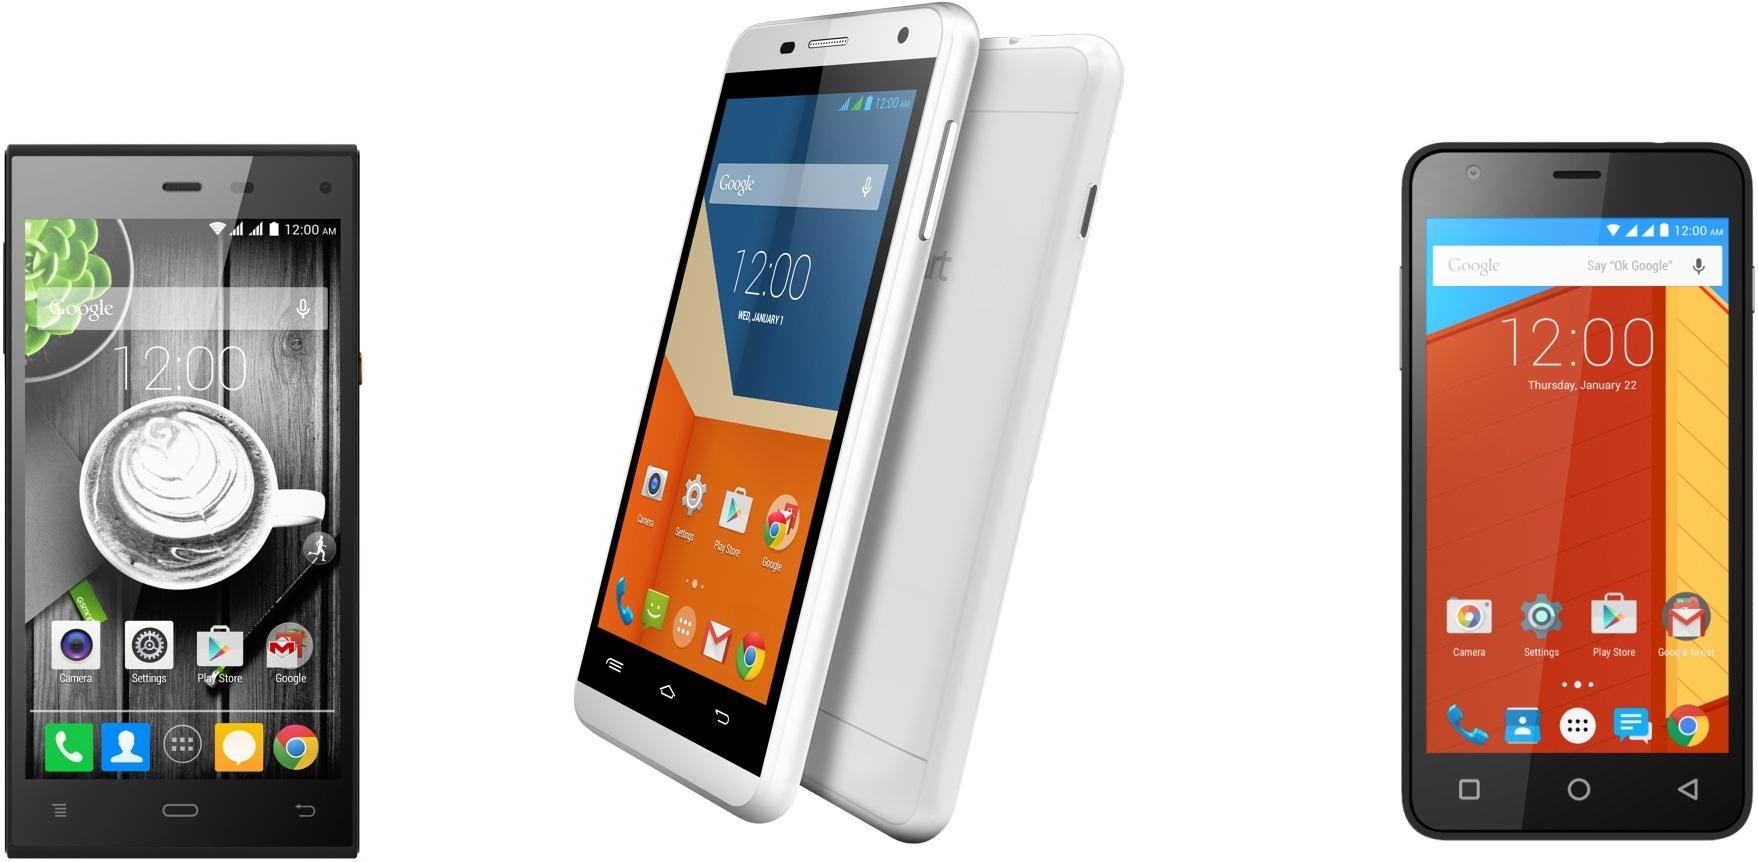 GIGABYTE GSmart - mobilné telefóny za skvelé ceny 993cca5c6cb